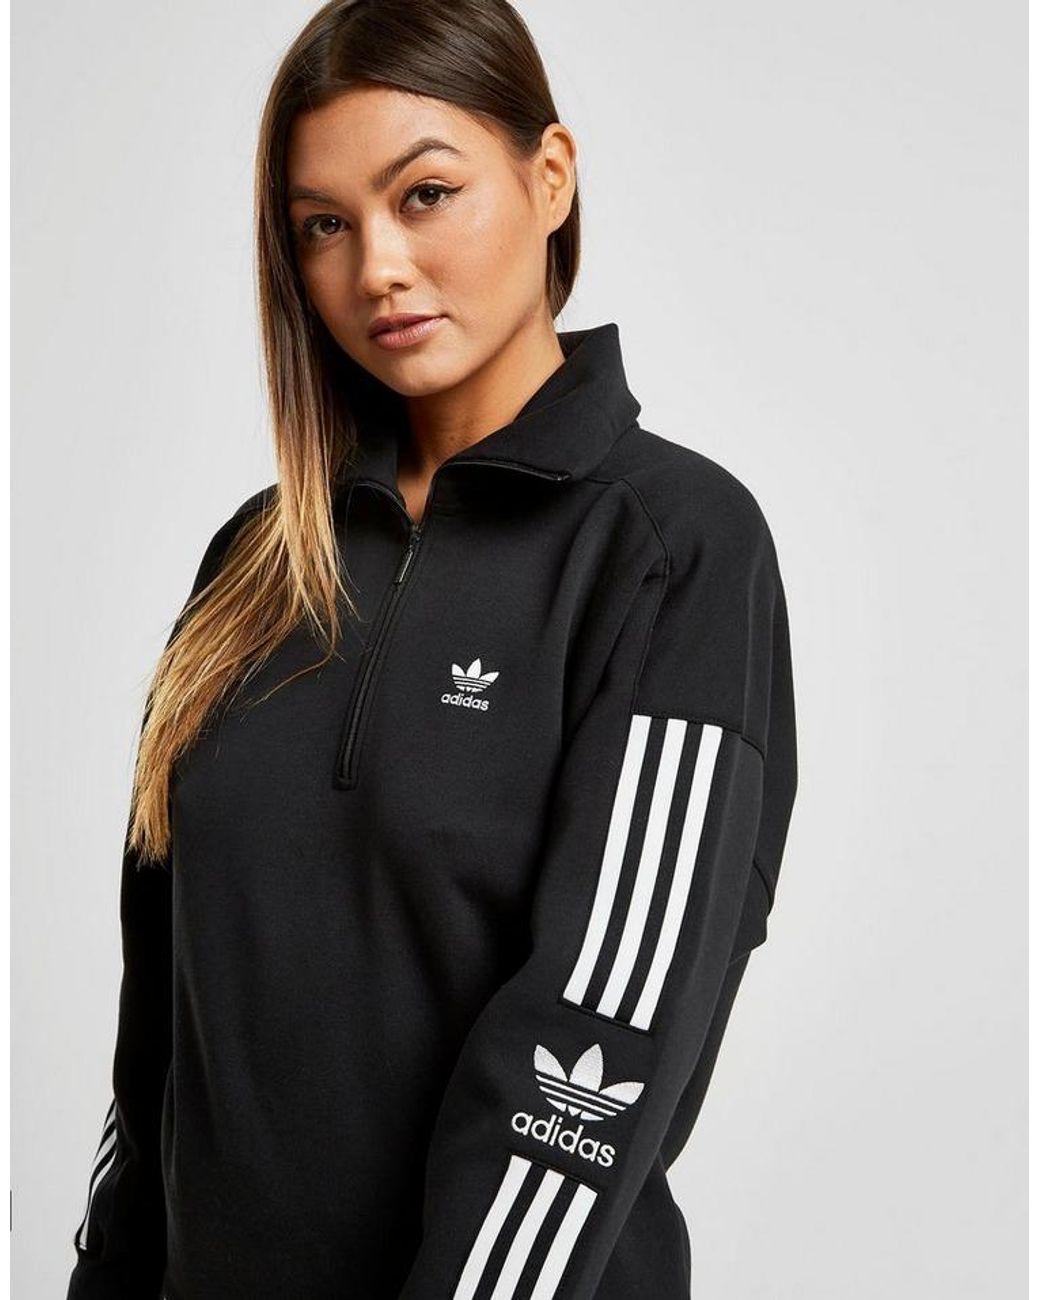 adidas Originals Cotton 3 stripes Lock Up 14 Zip Sweatshirt